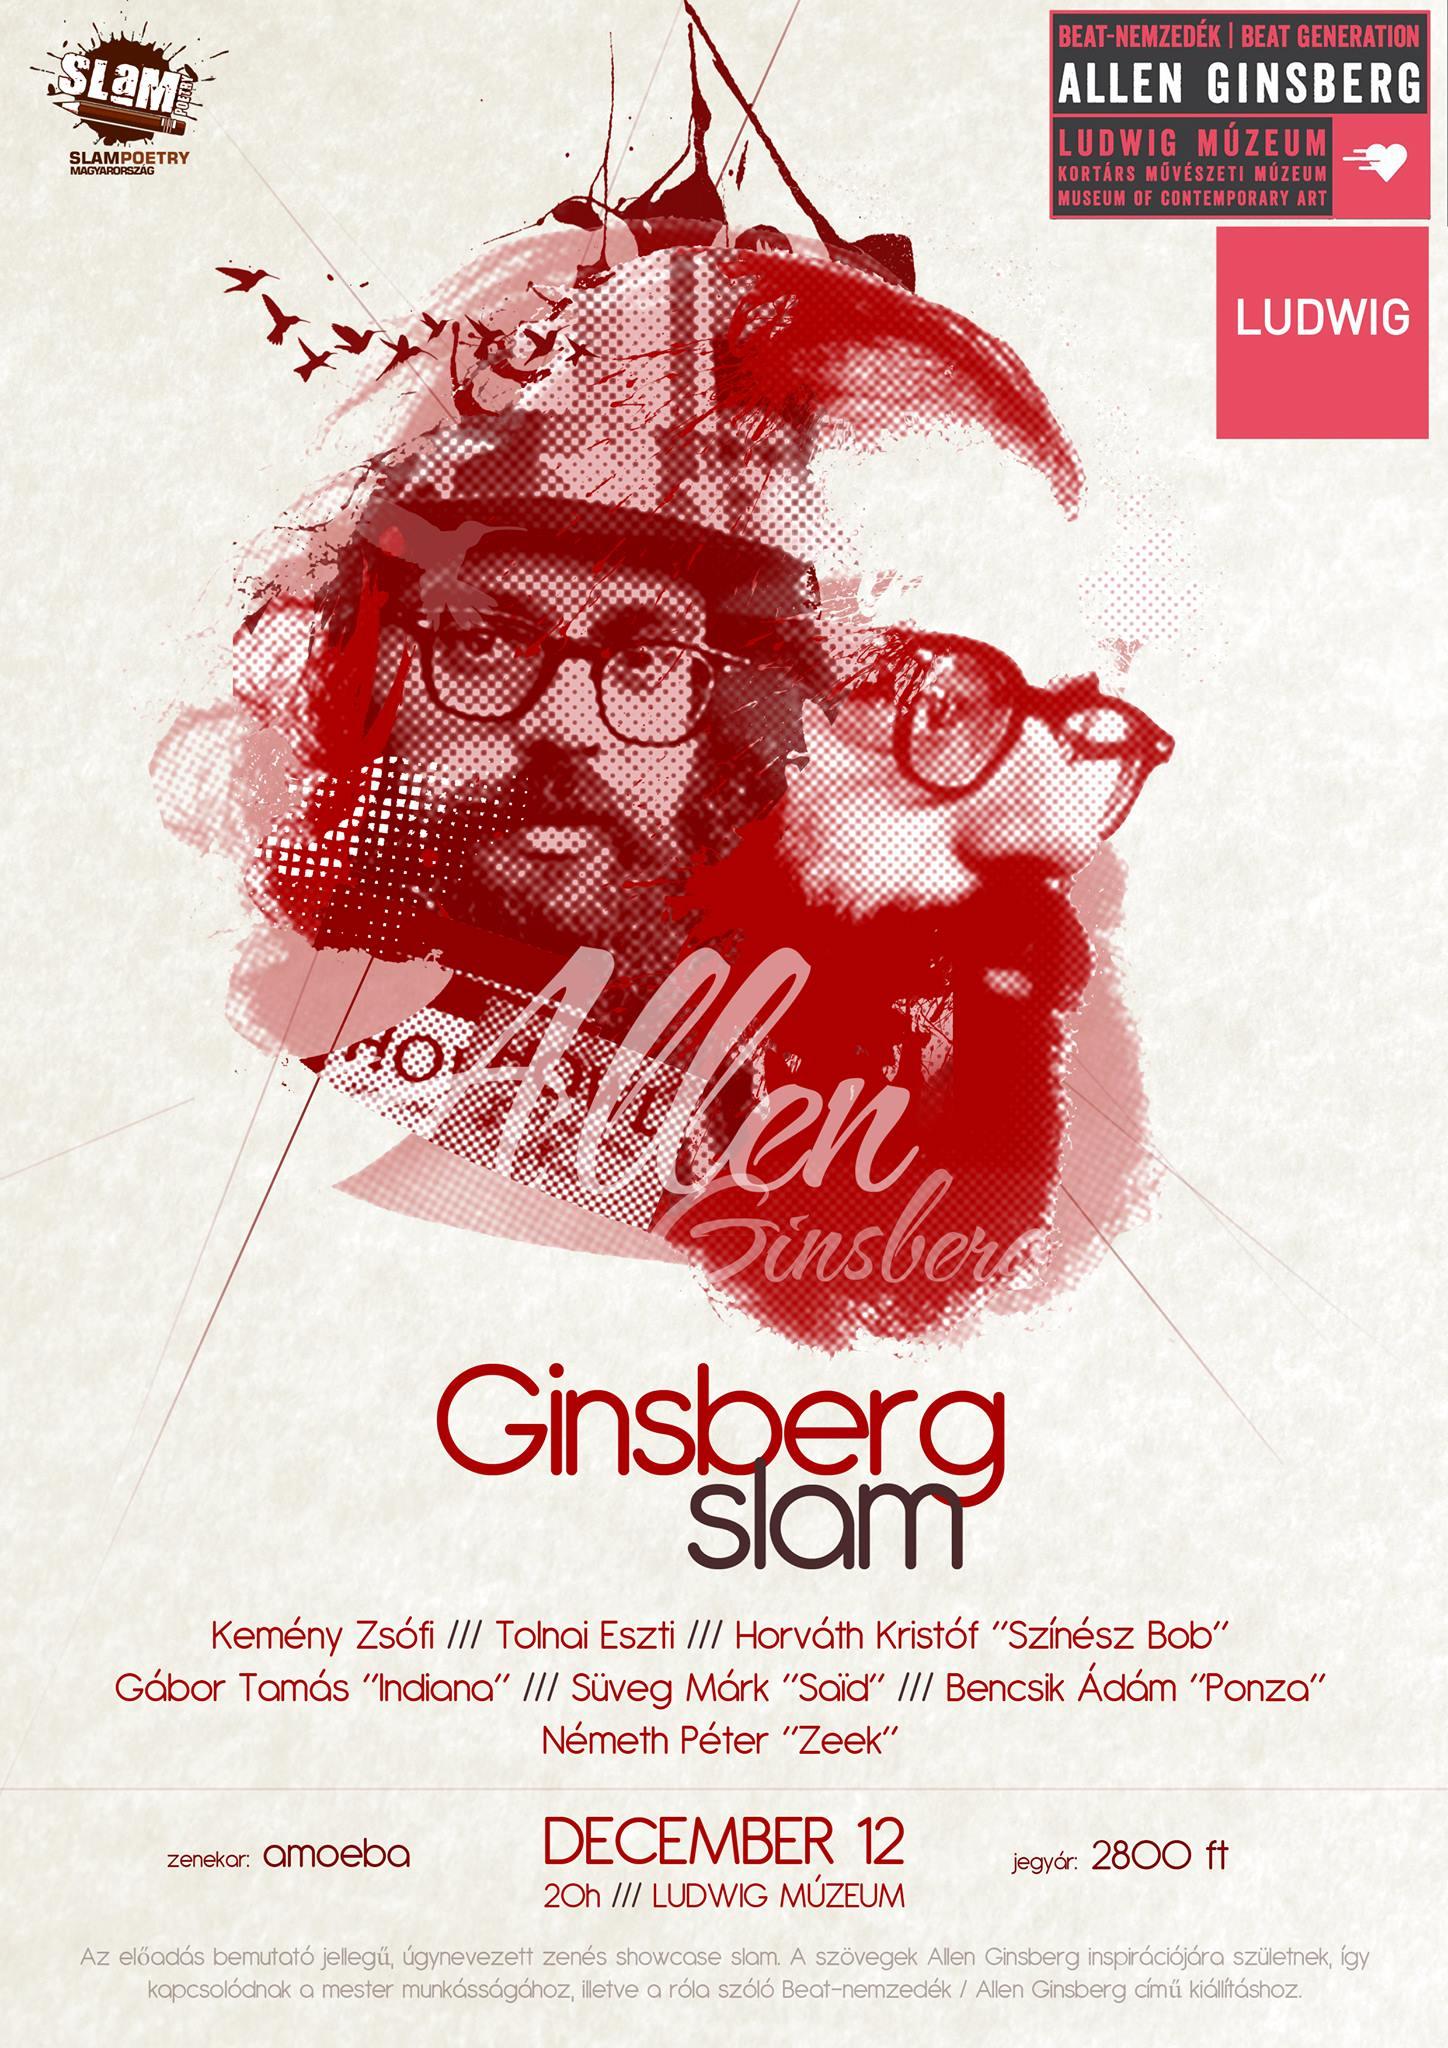 Hommage à Allen Ginsberg